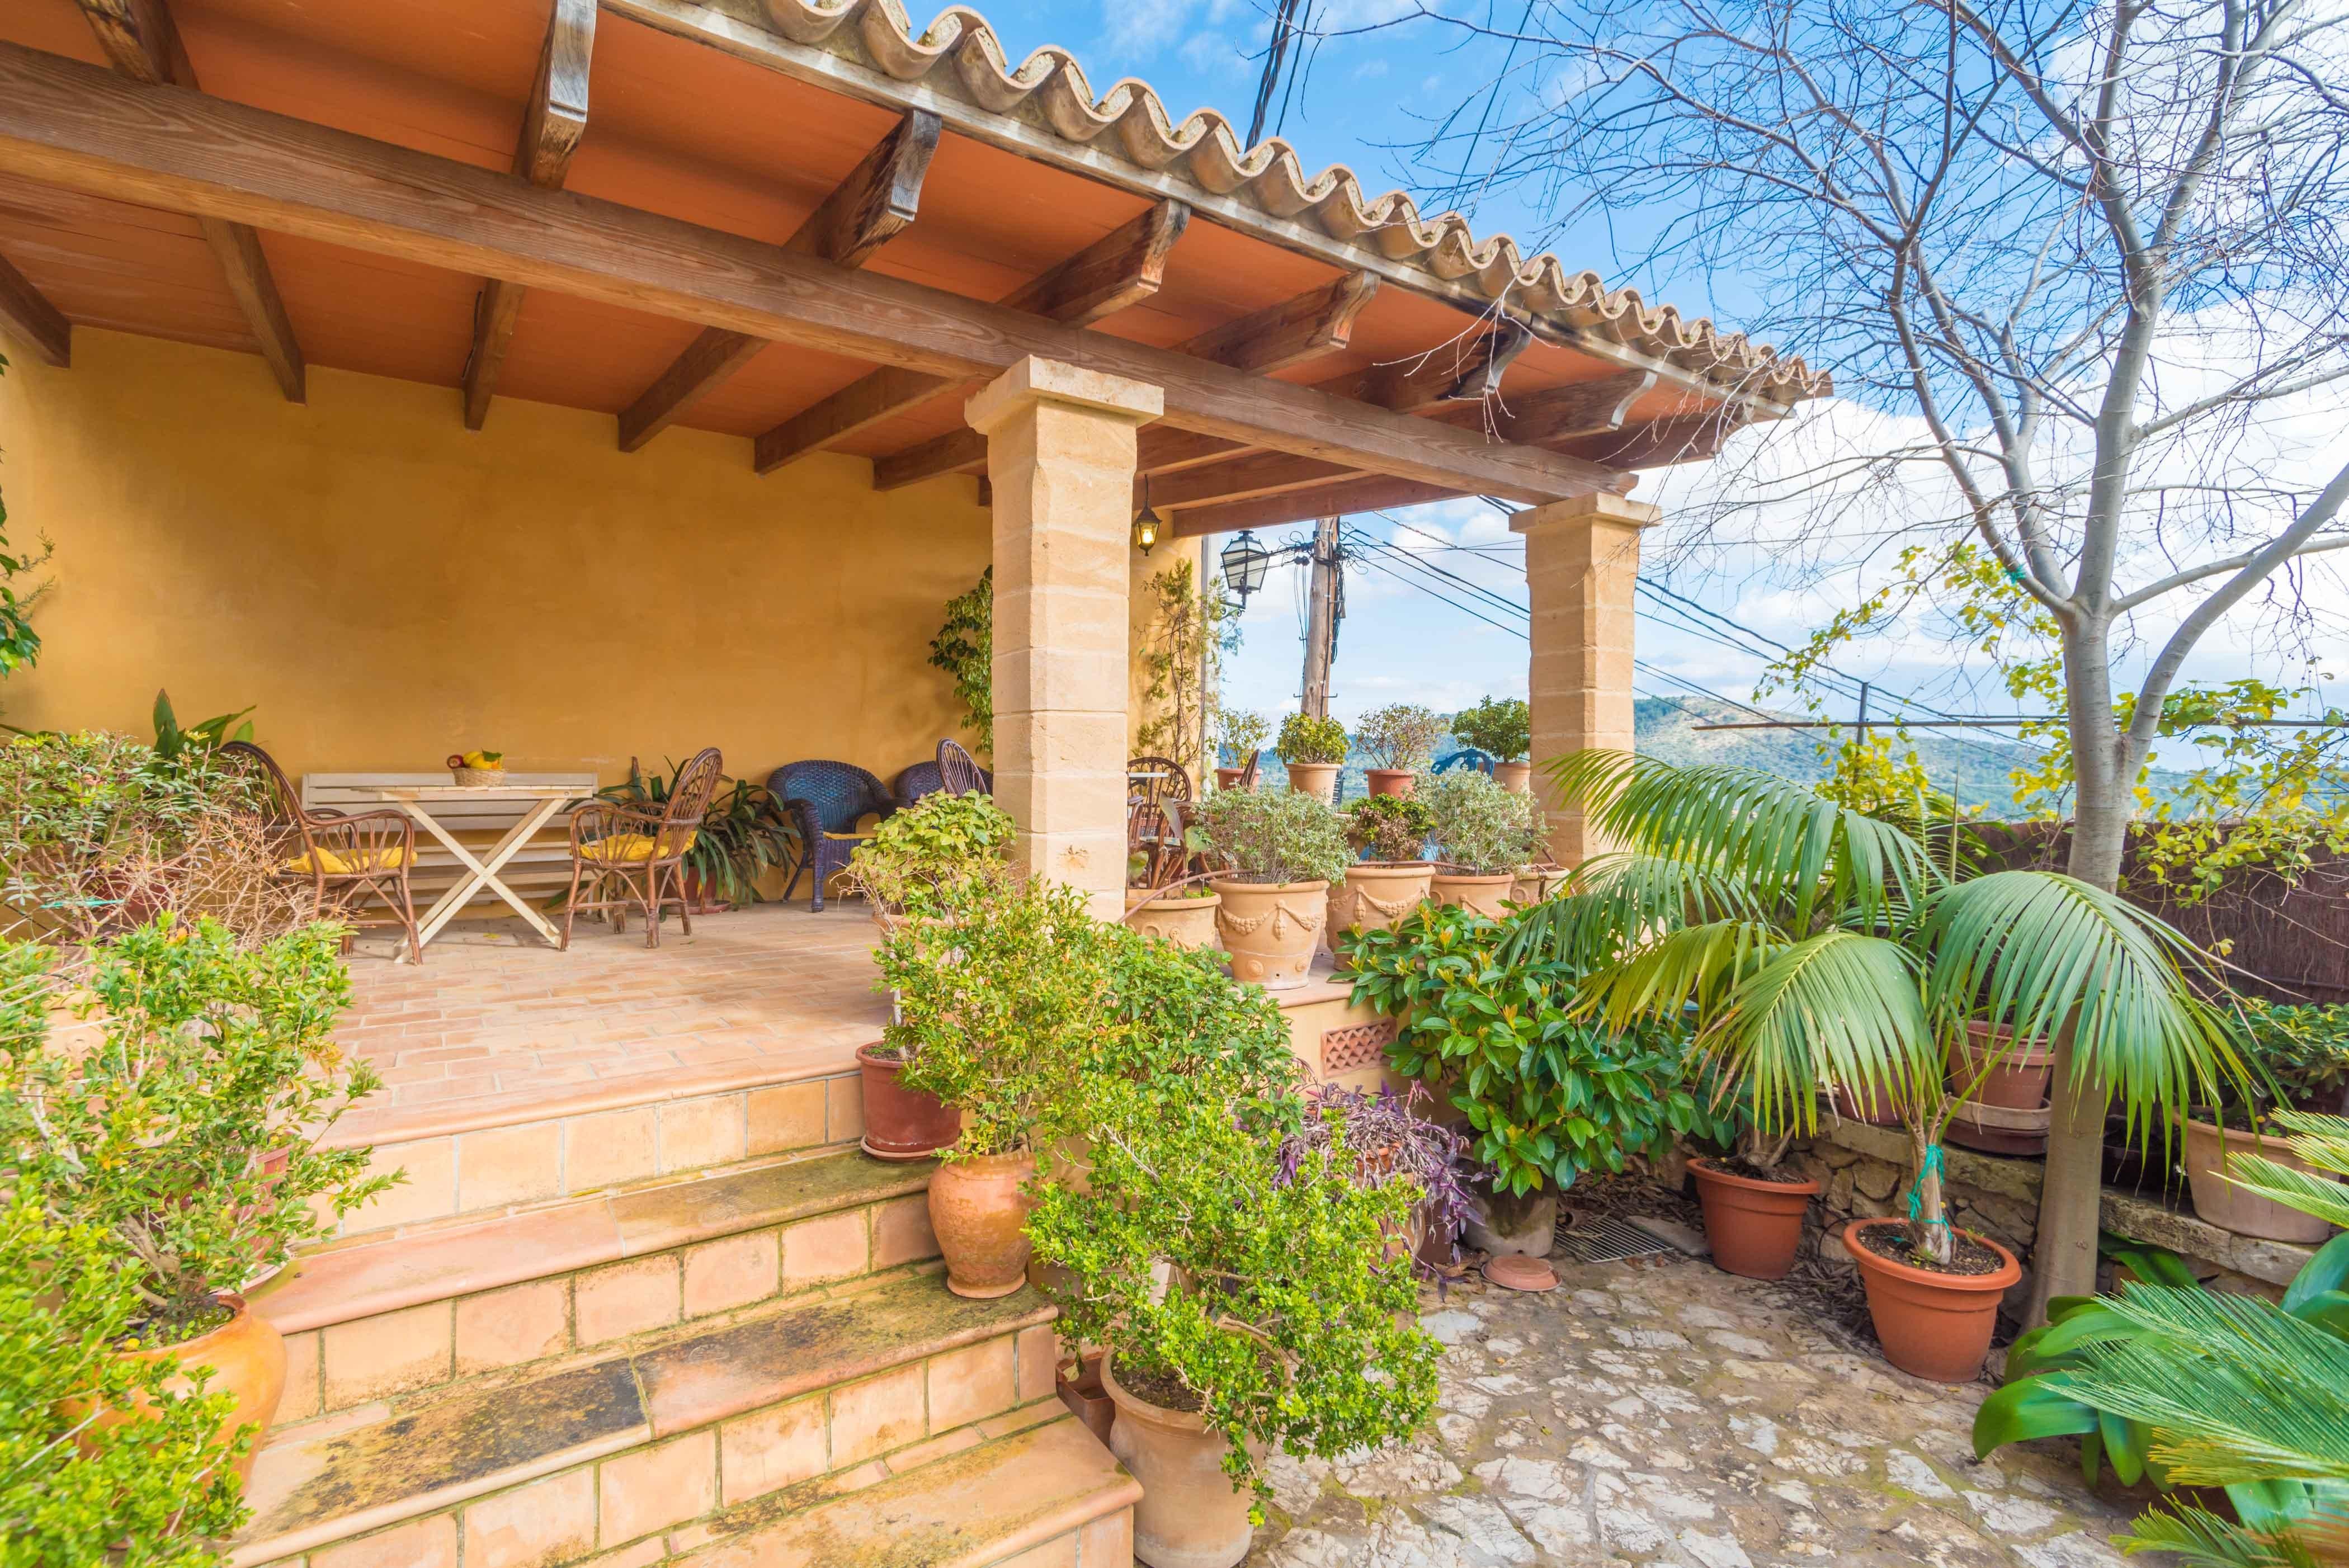 Maison de vacances CA NA CARME (ALARONERA) (2382858), Alaro, Majorque, Iles Baléares, Espagne, image 6